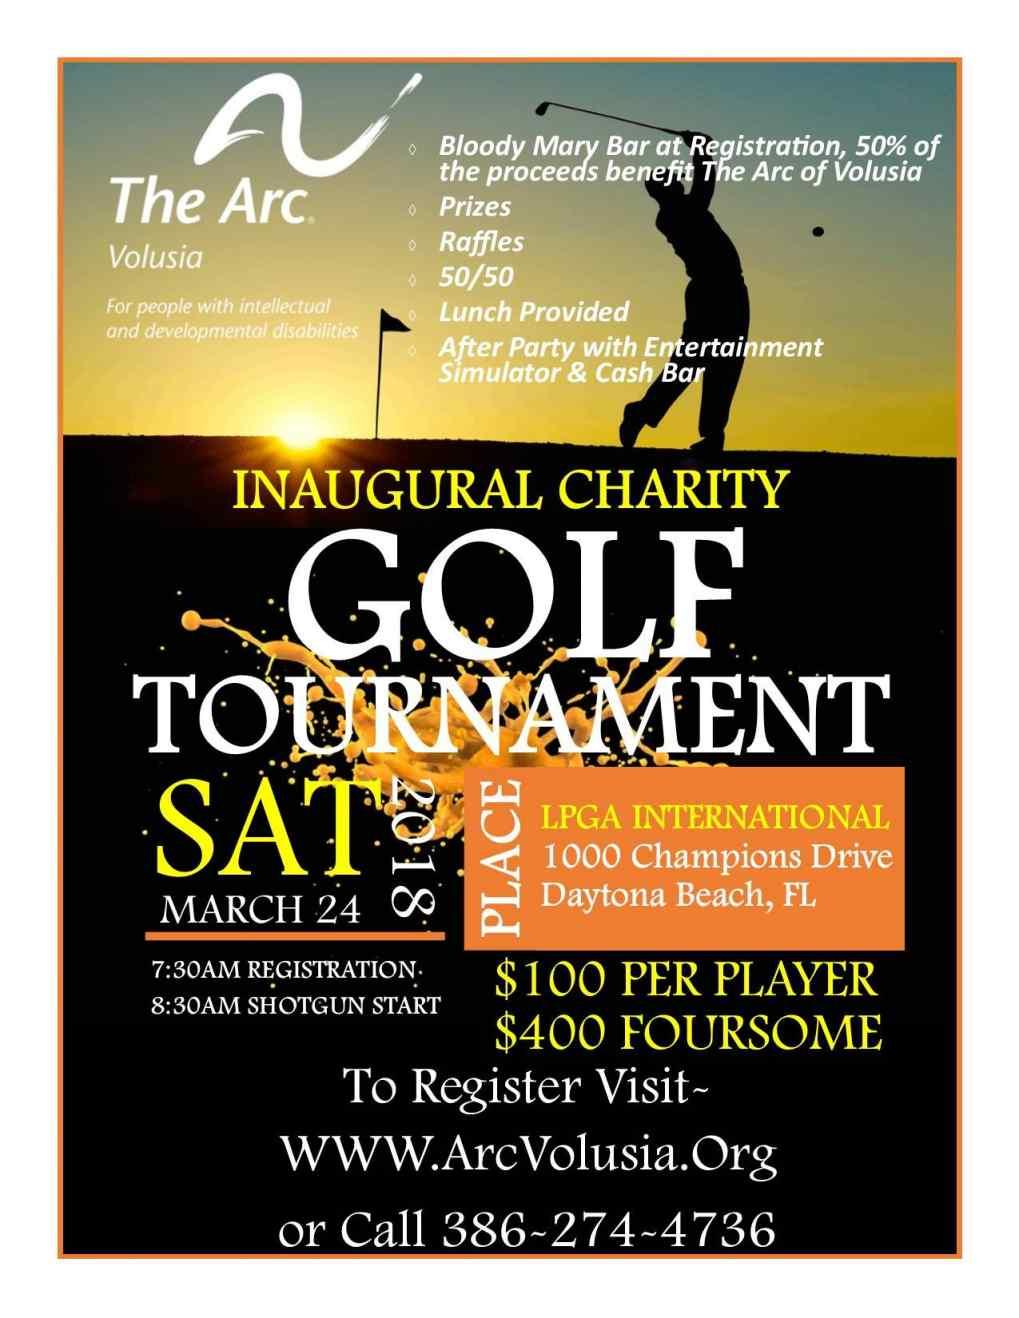 Arc Volusia Charity Golf Tournament